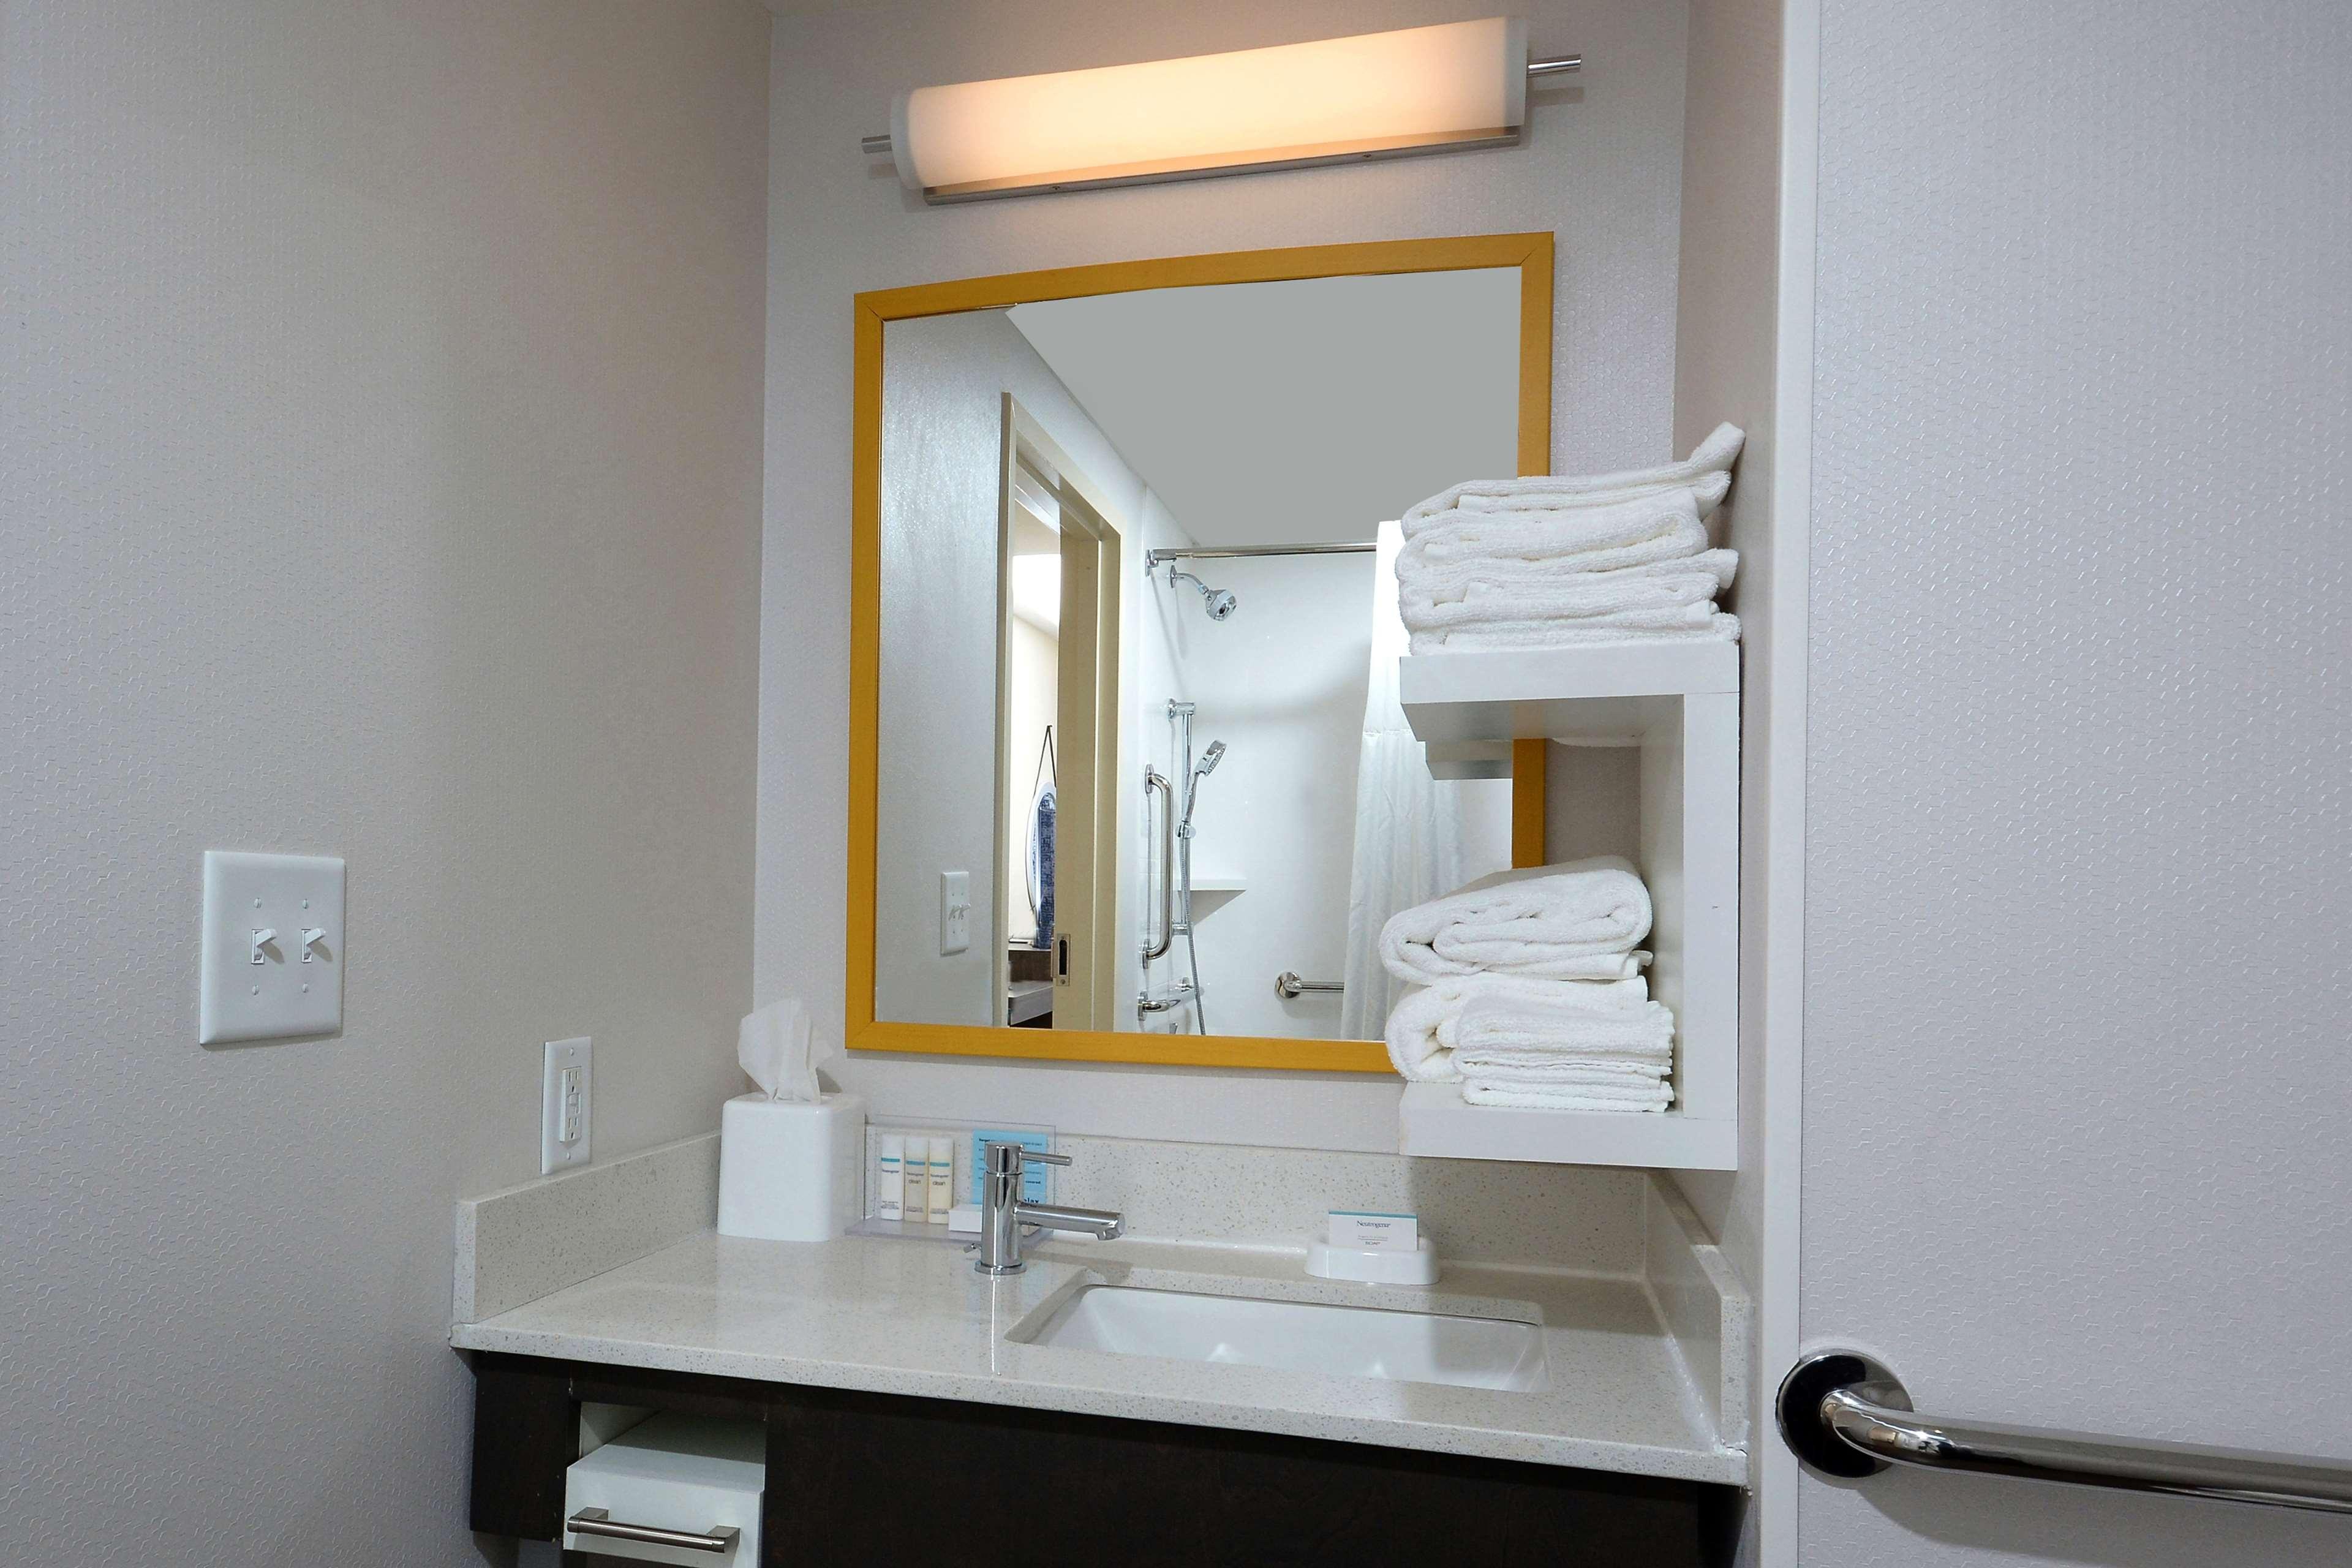 Hampton Inn & Suites Greenville/Spartanburg I-85 image 39